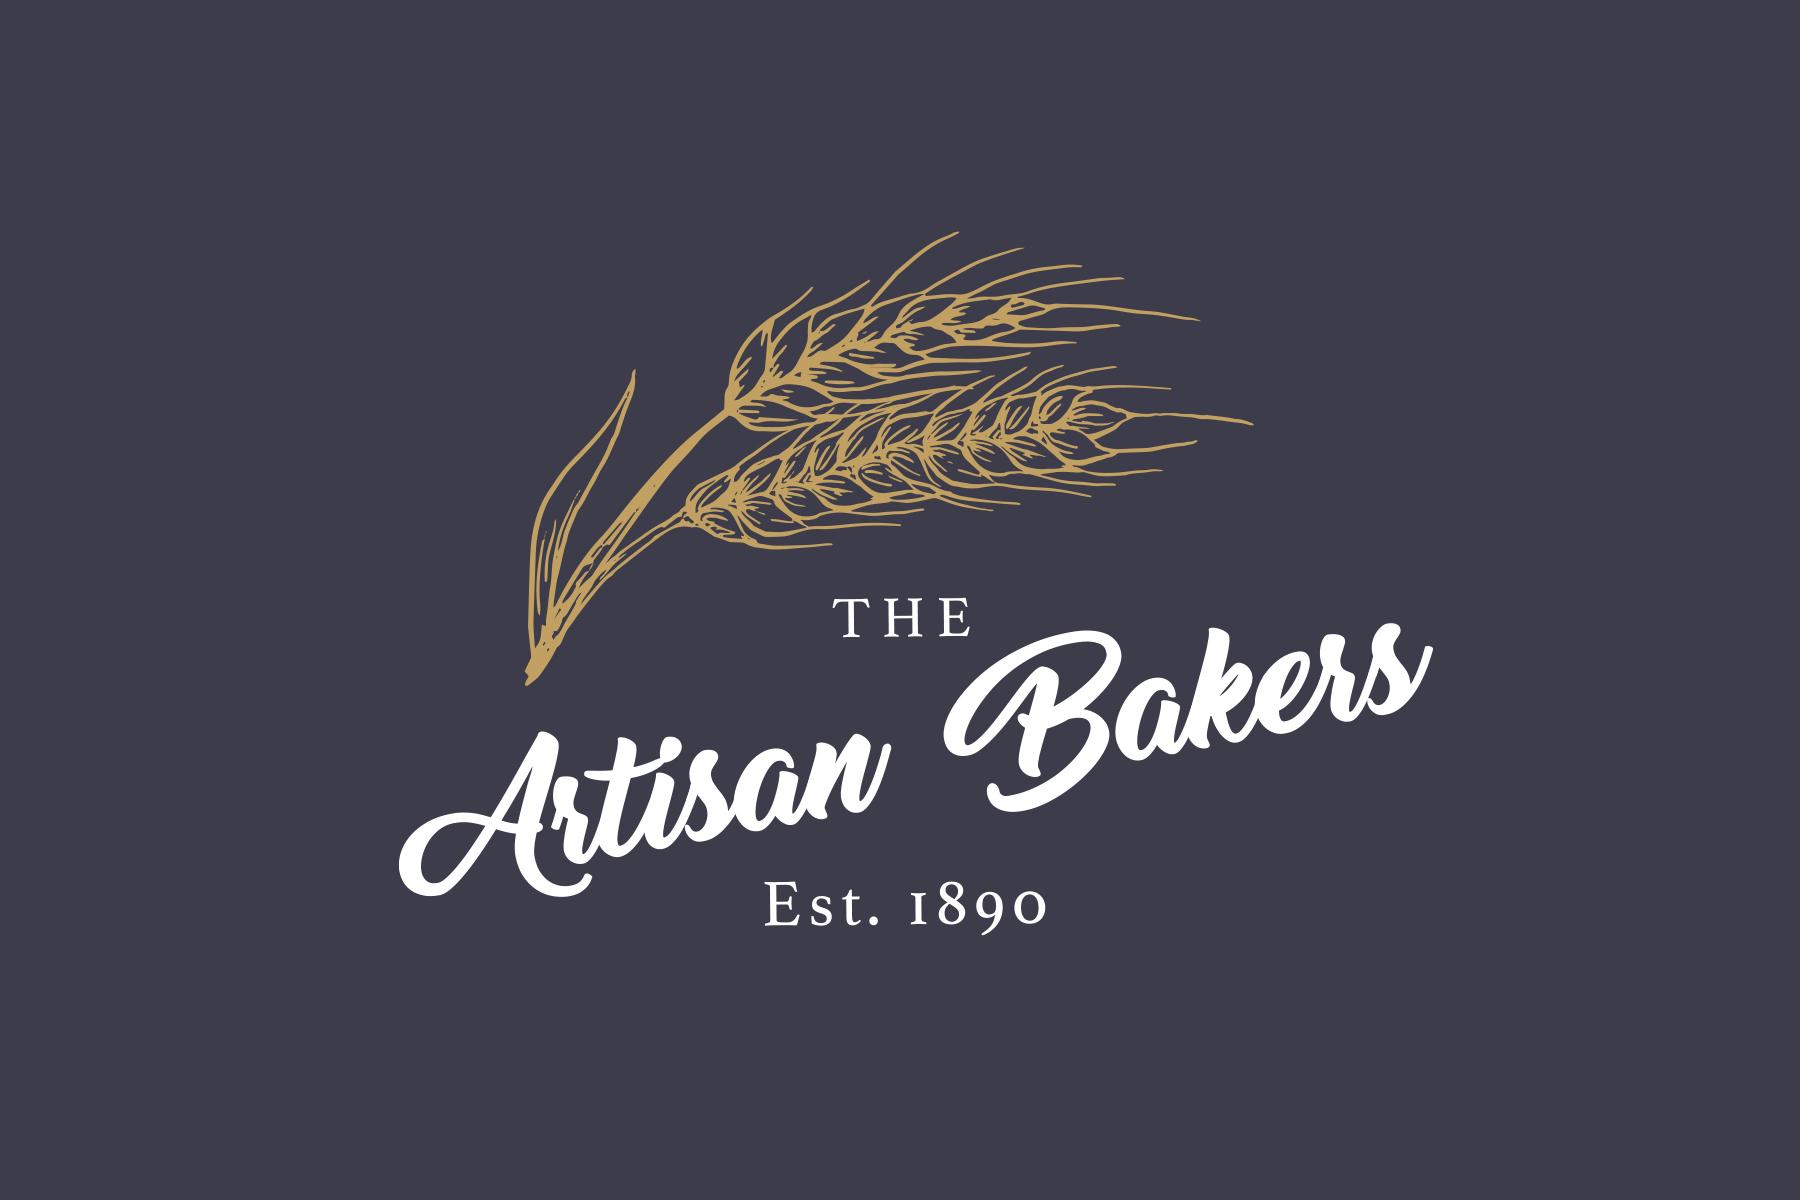 the artisan bakers logo blue